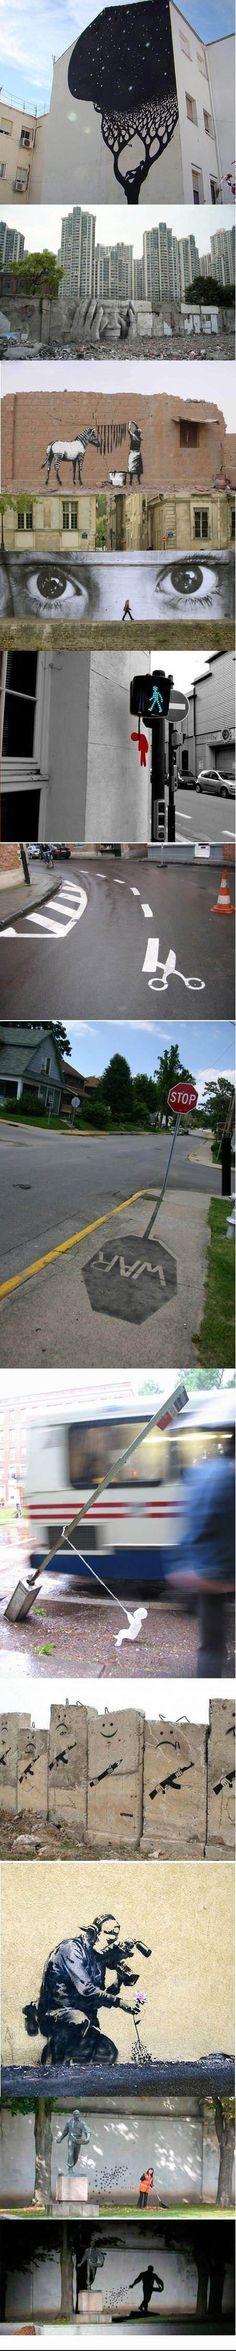 Some street arts « Odditiesity